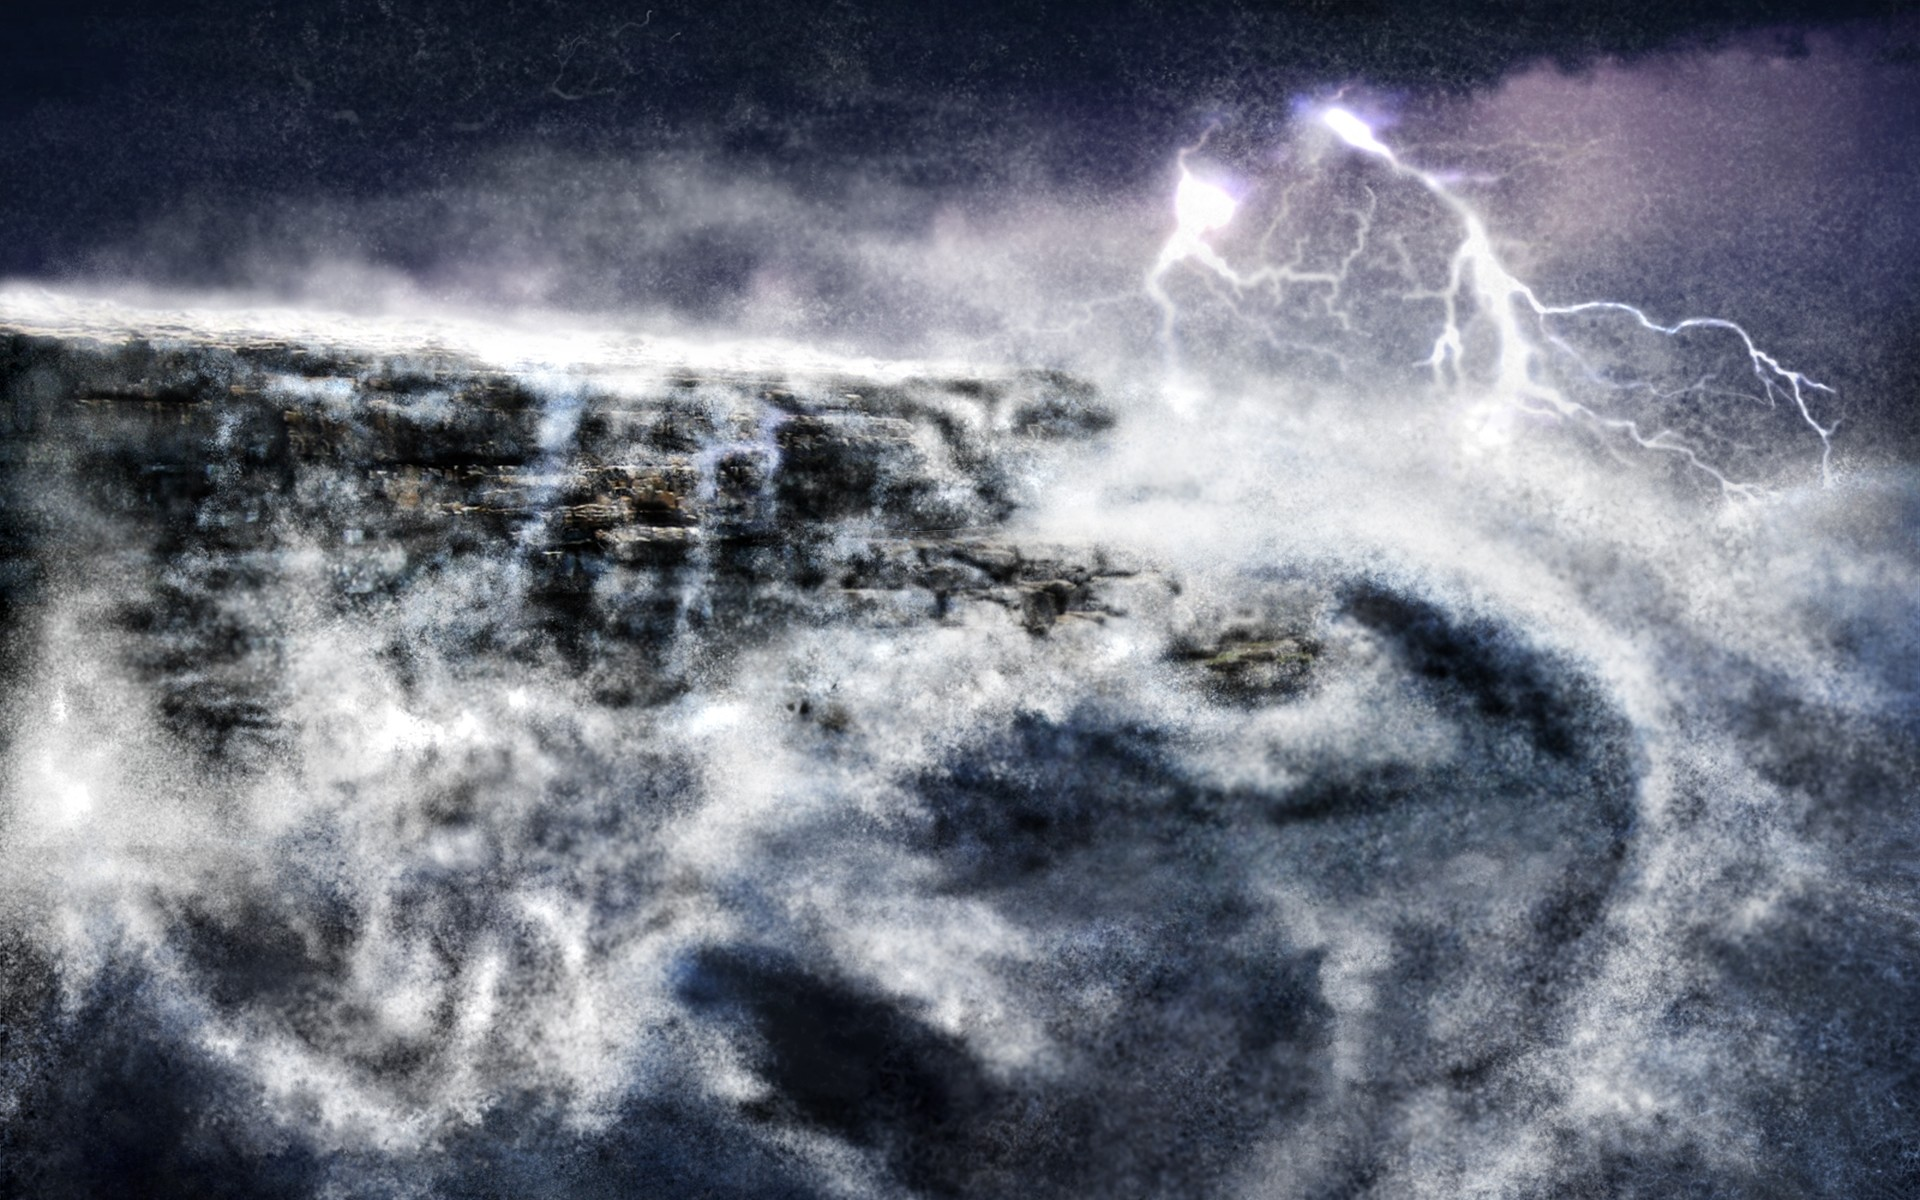 Lightning Storm Wallpapers For Desktop.